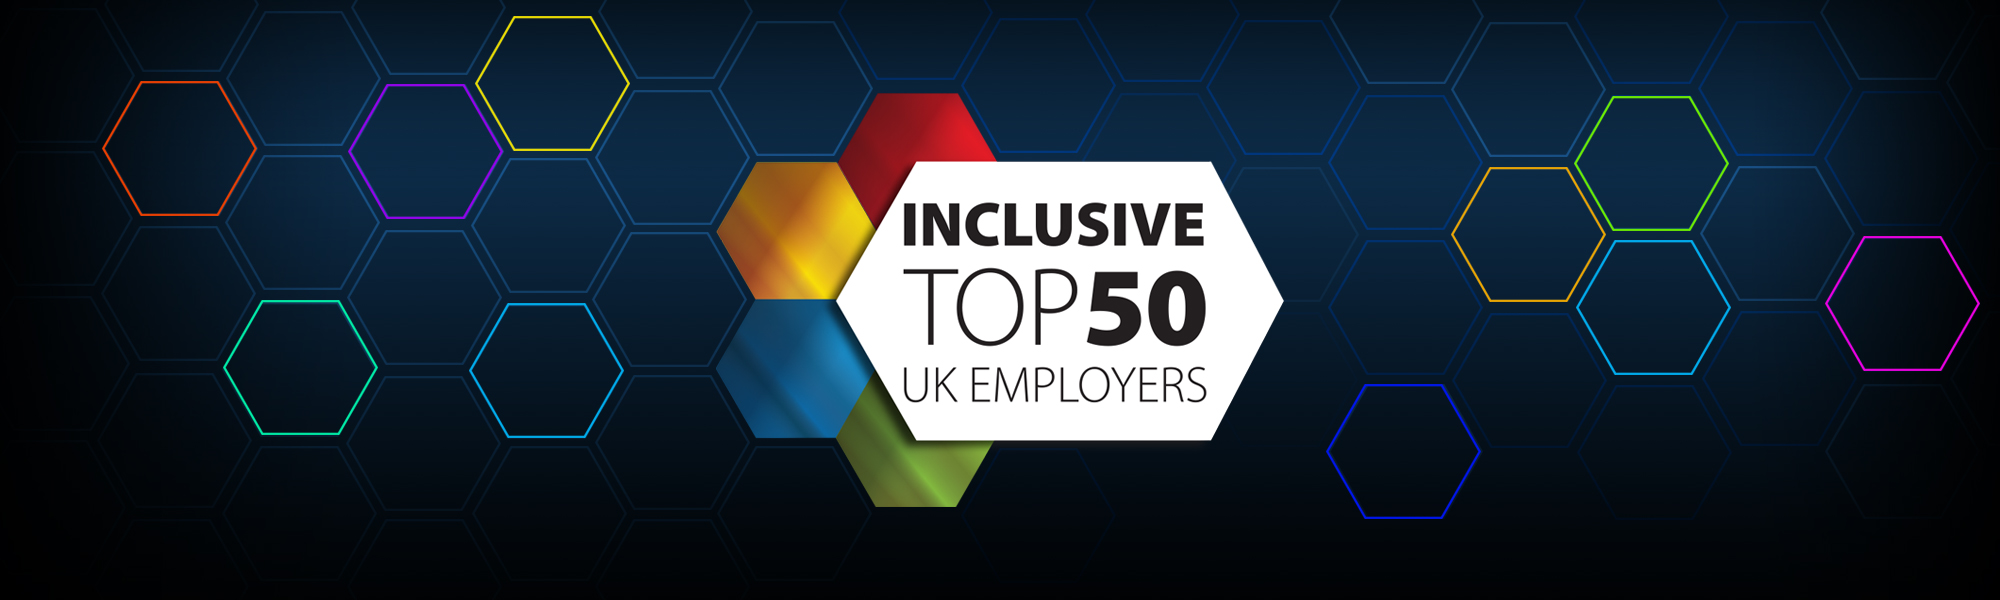 Inclusive Top 50 UK Employers